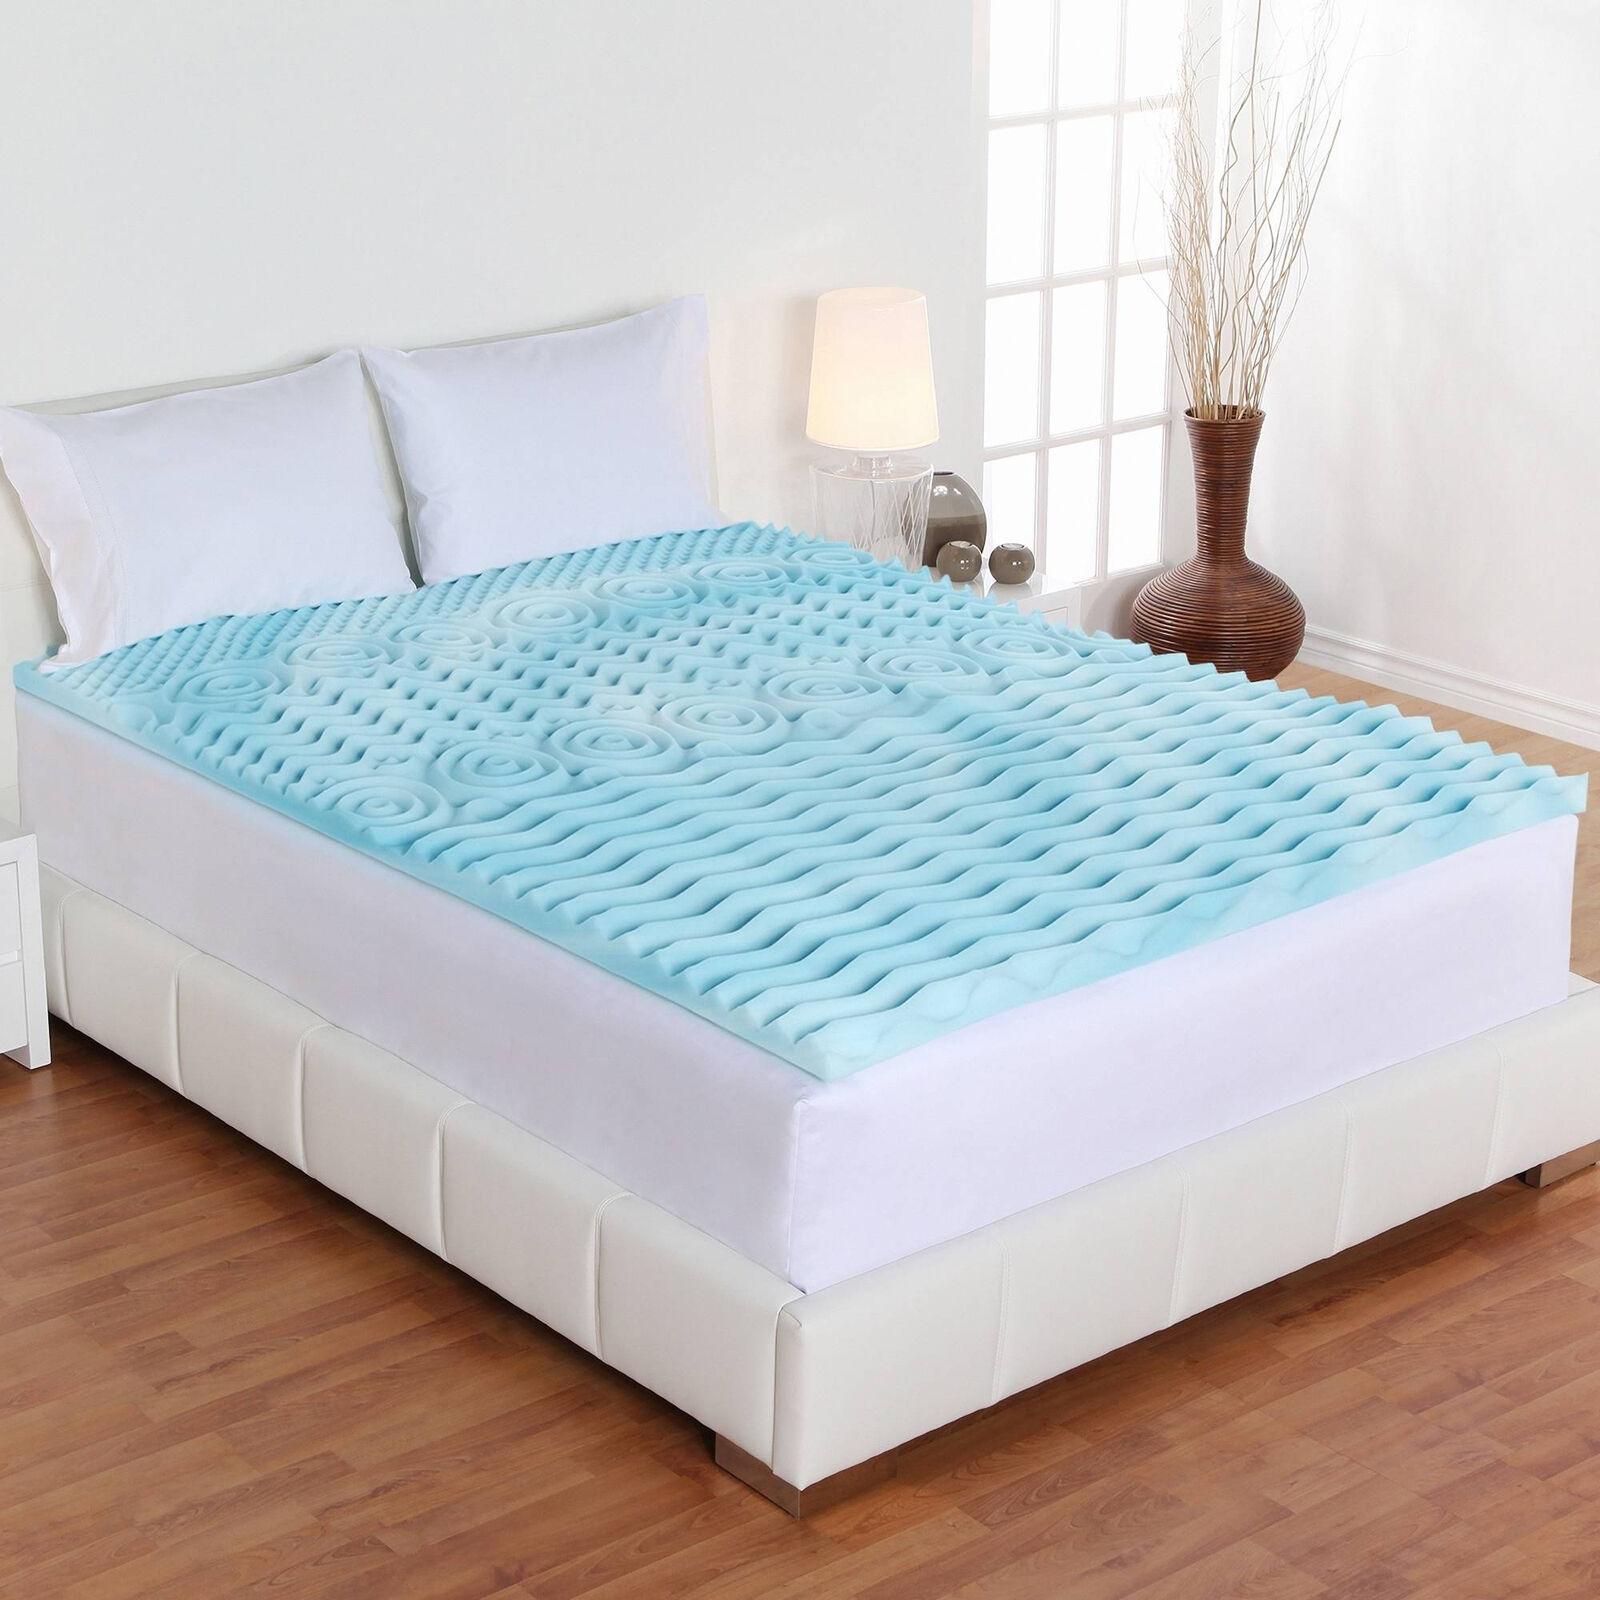 3 inch KING Größe Mattress Topper Memory Foam Gel Pad Cover Bedding Orthopedic